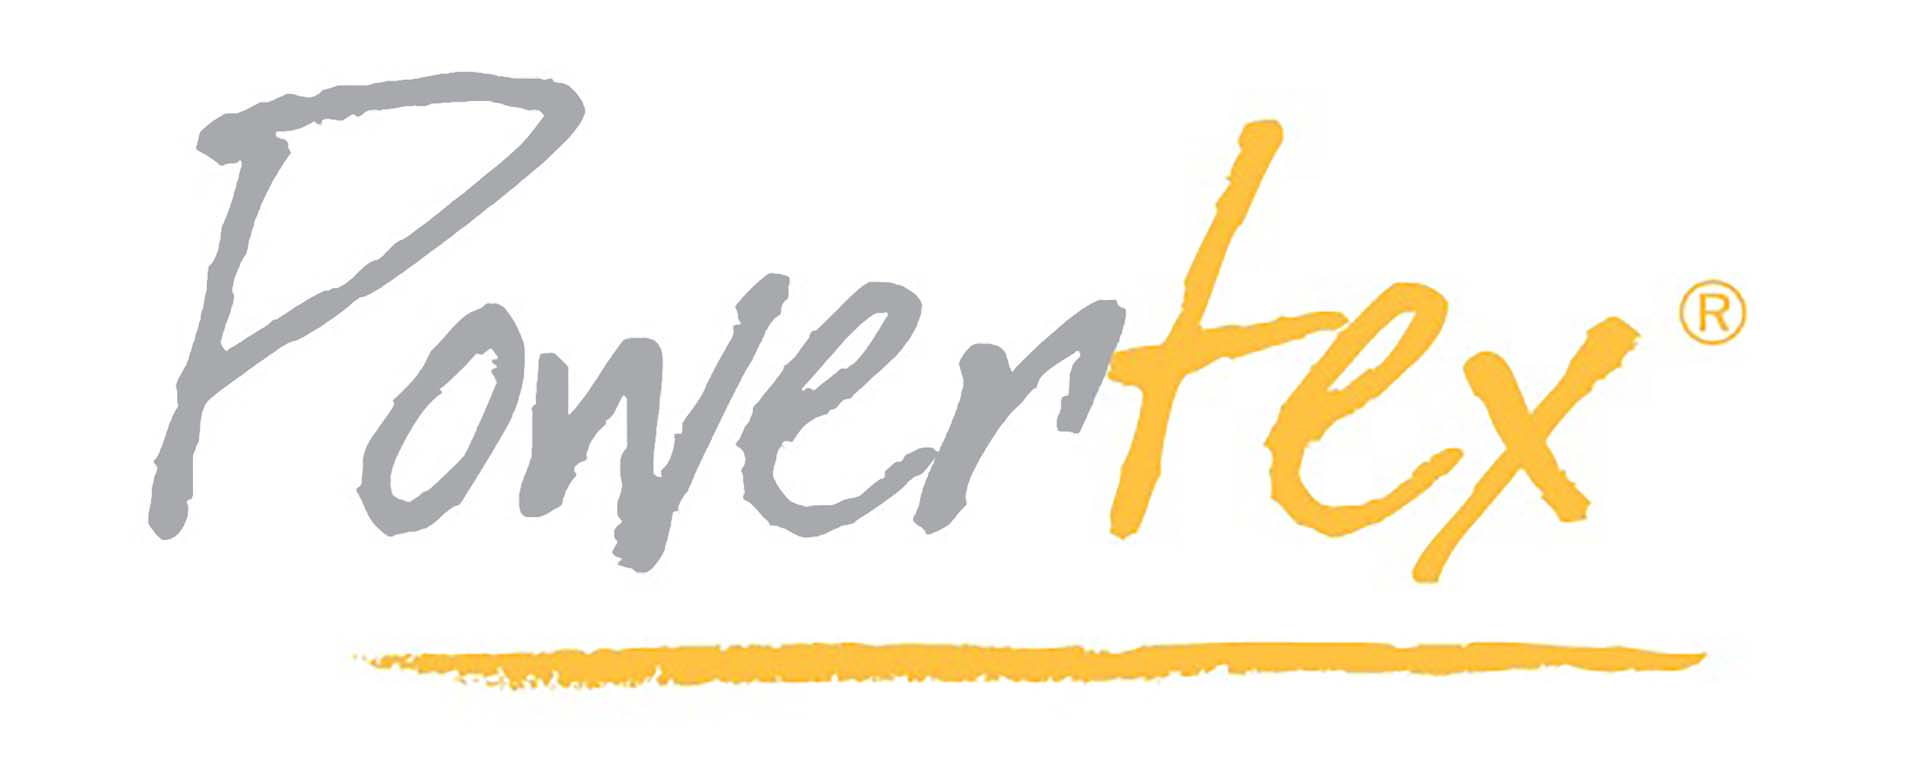 hoover Powertex logo 768x1920